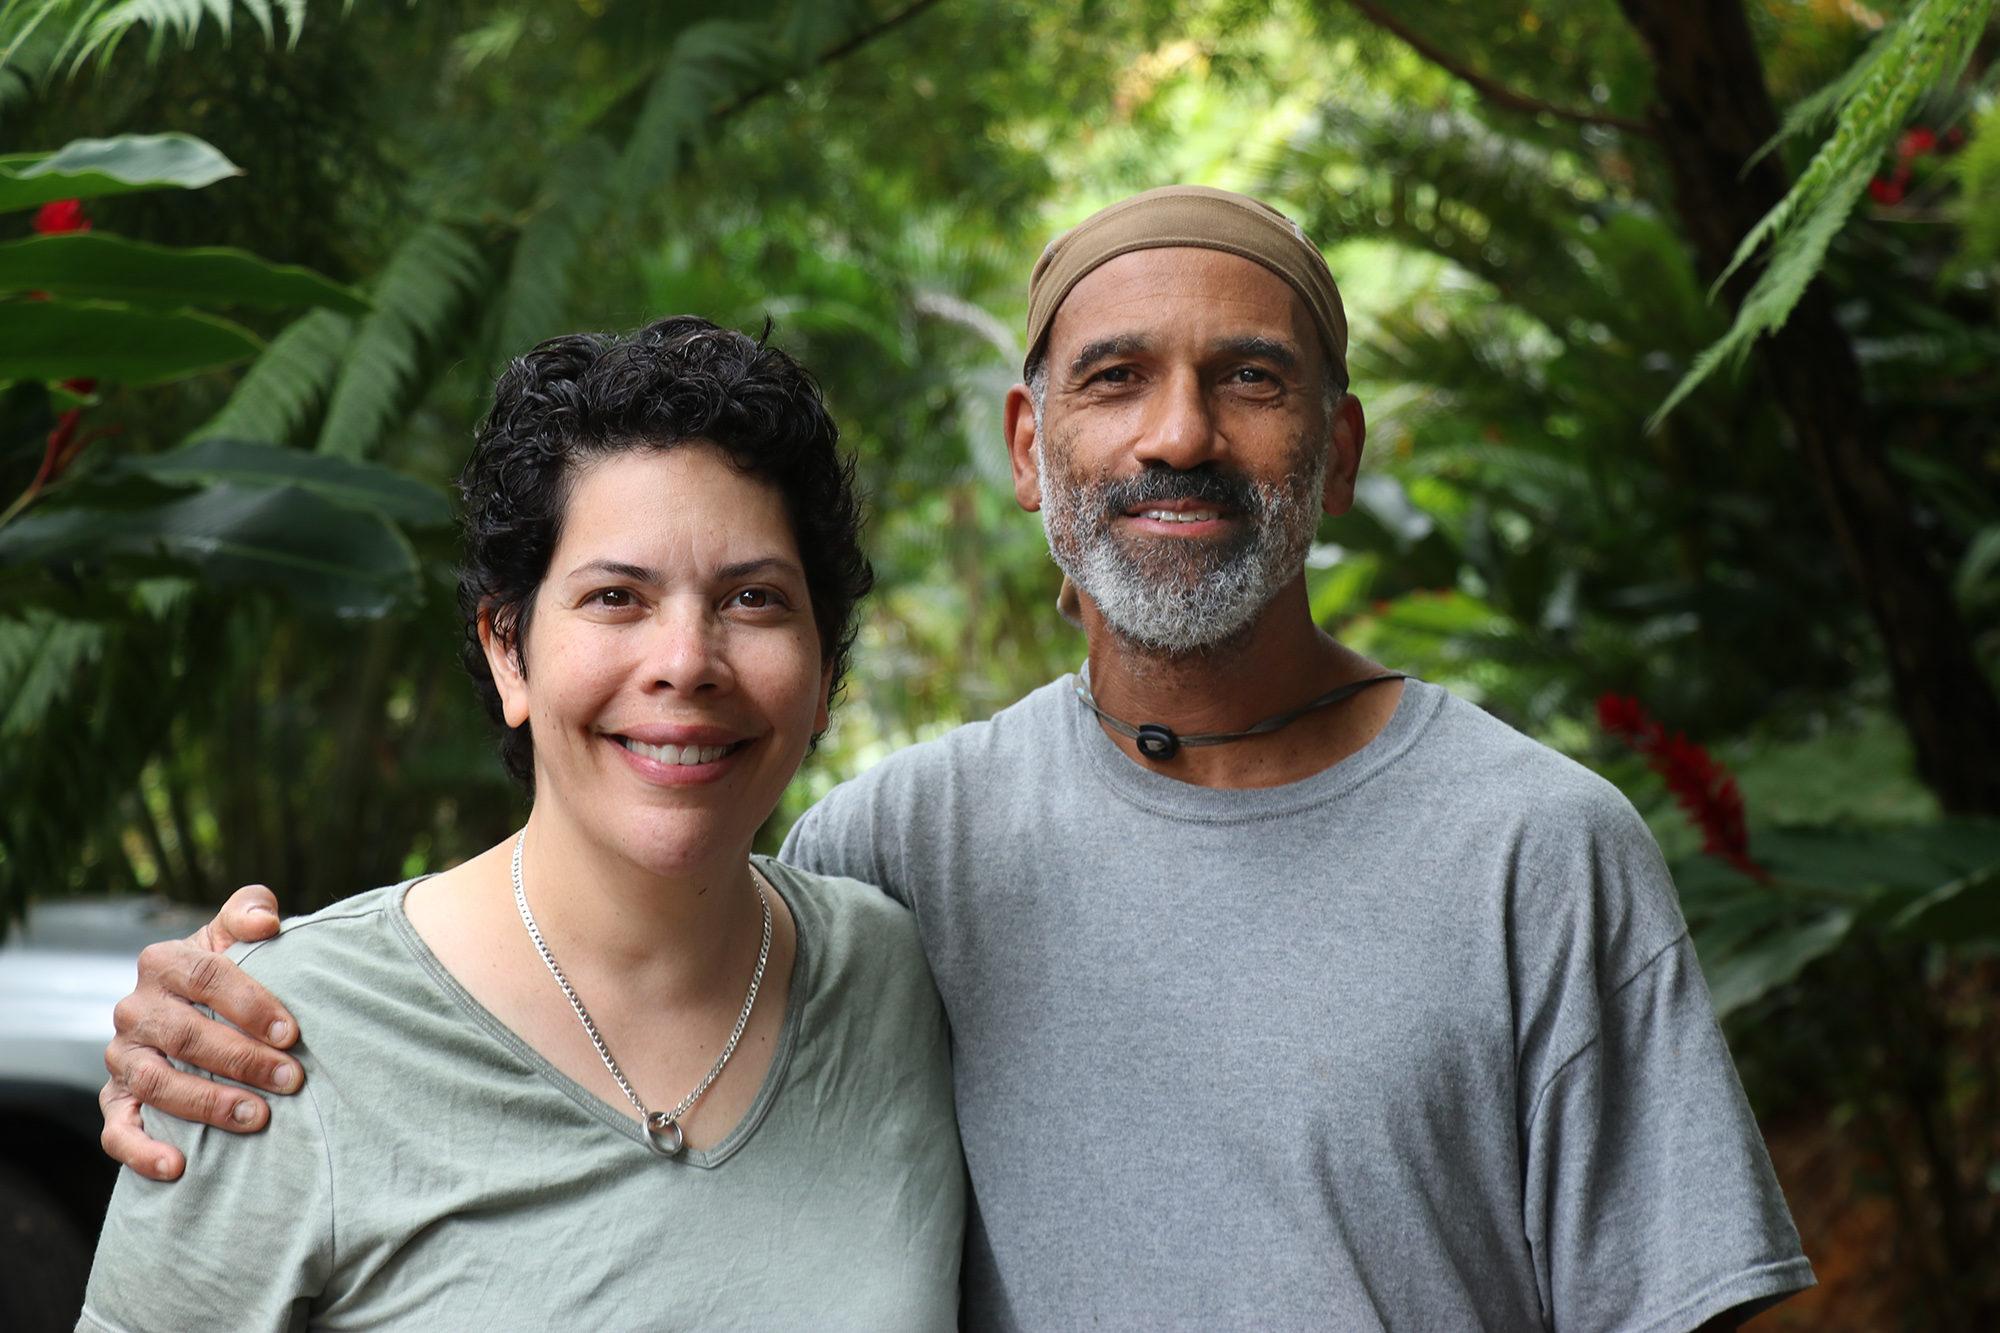 Sarah and Paul Ratliff at Mayani Farms. Photo by Tina Locurto